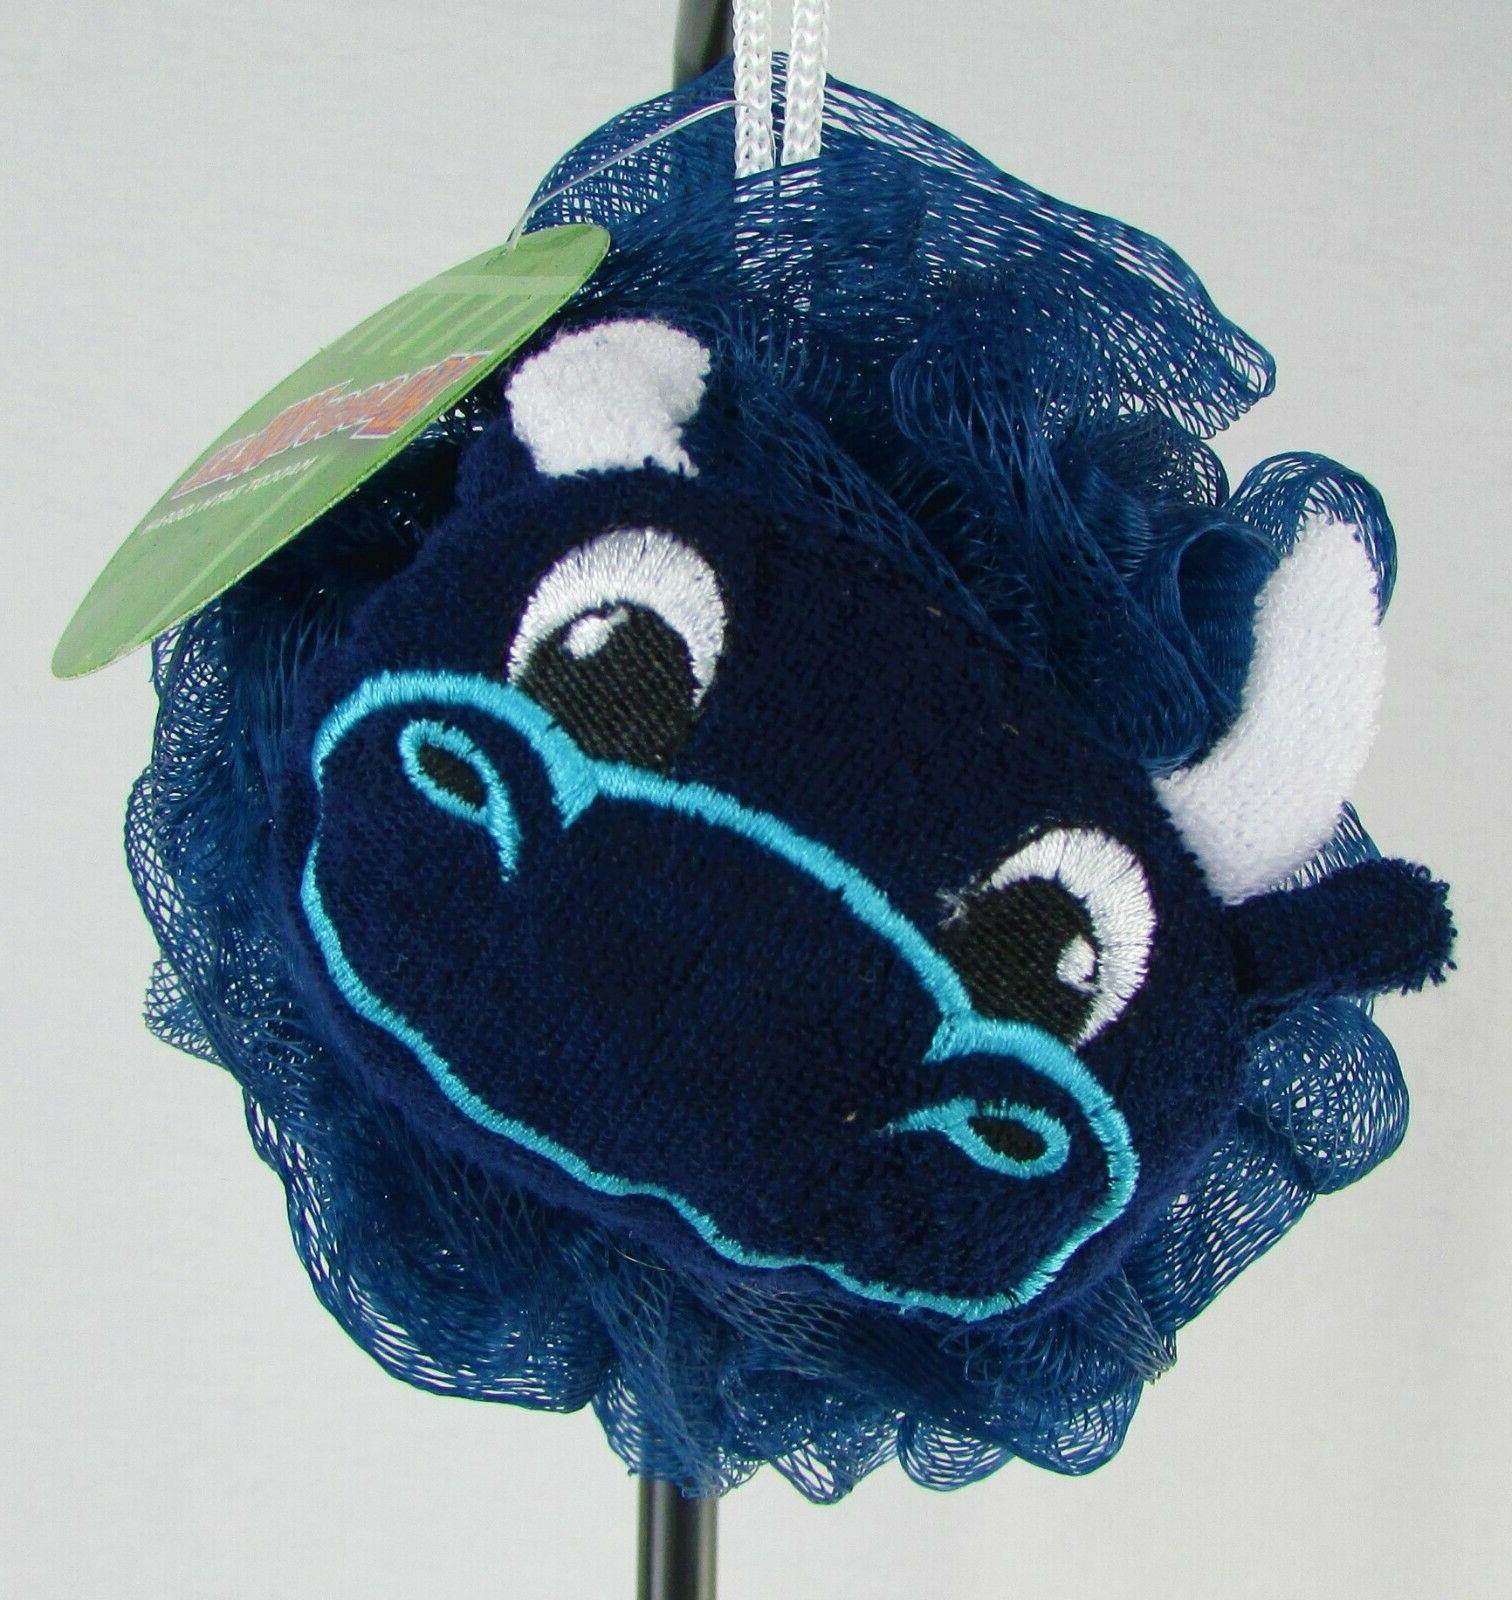 nfl team logo mascot wear bath loofah